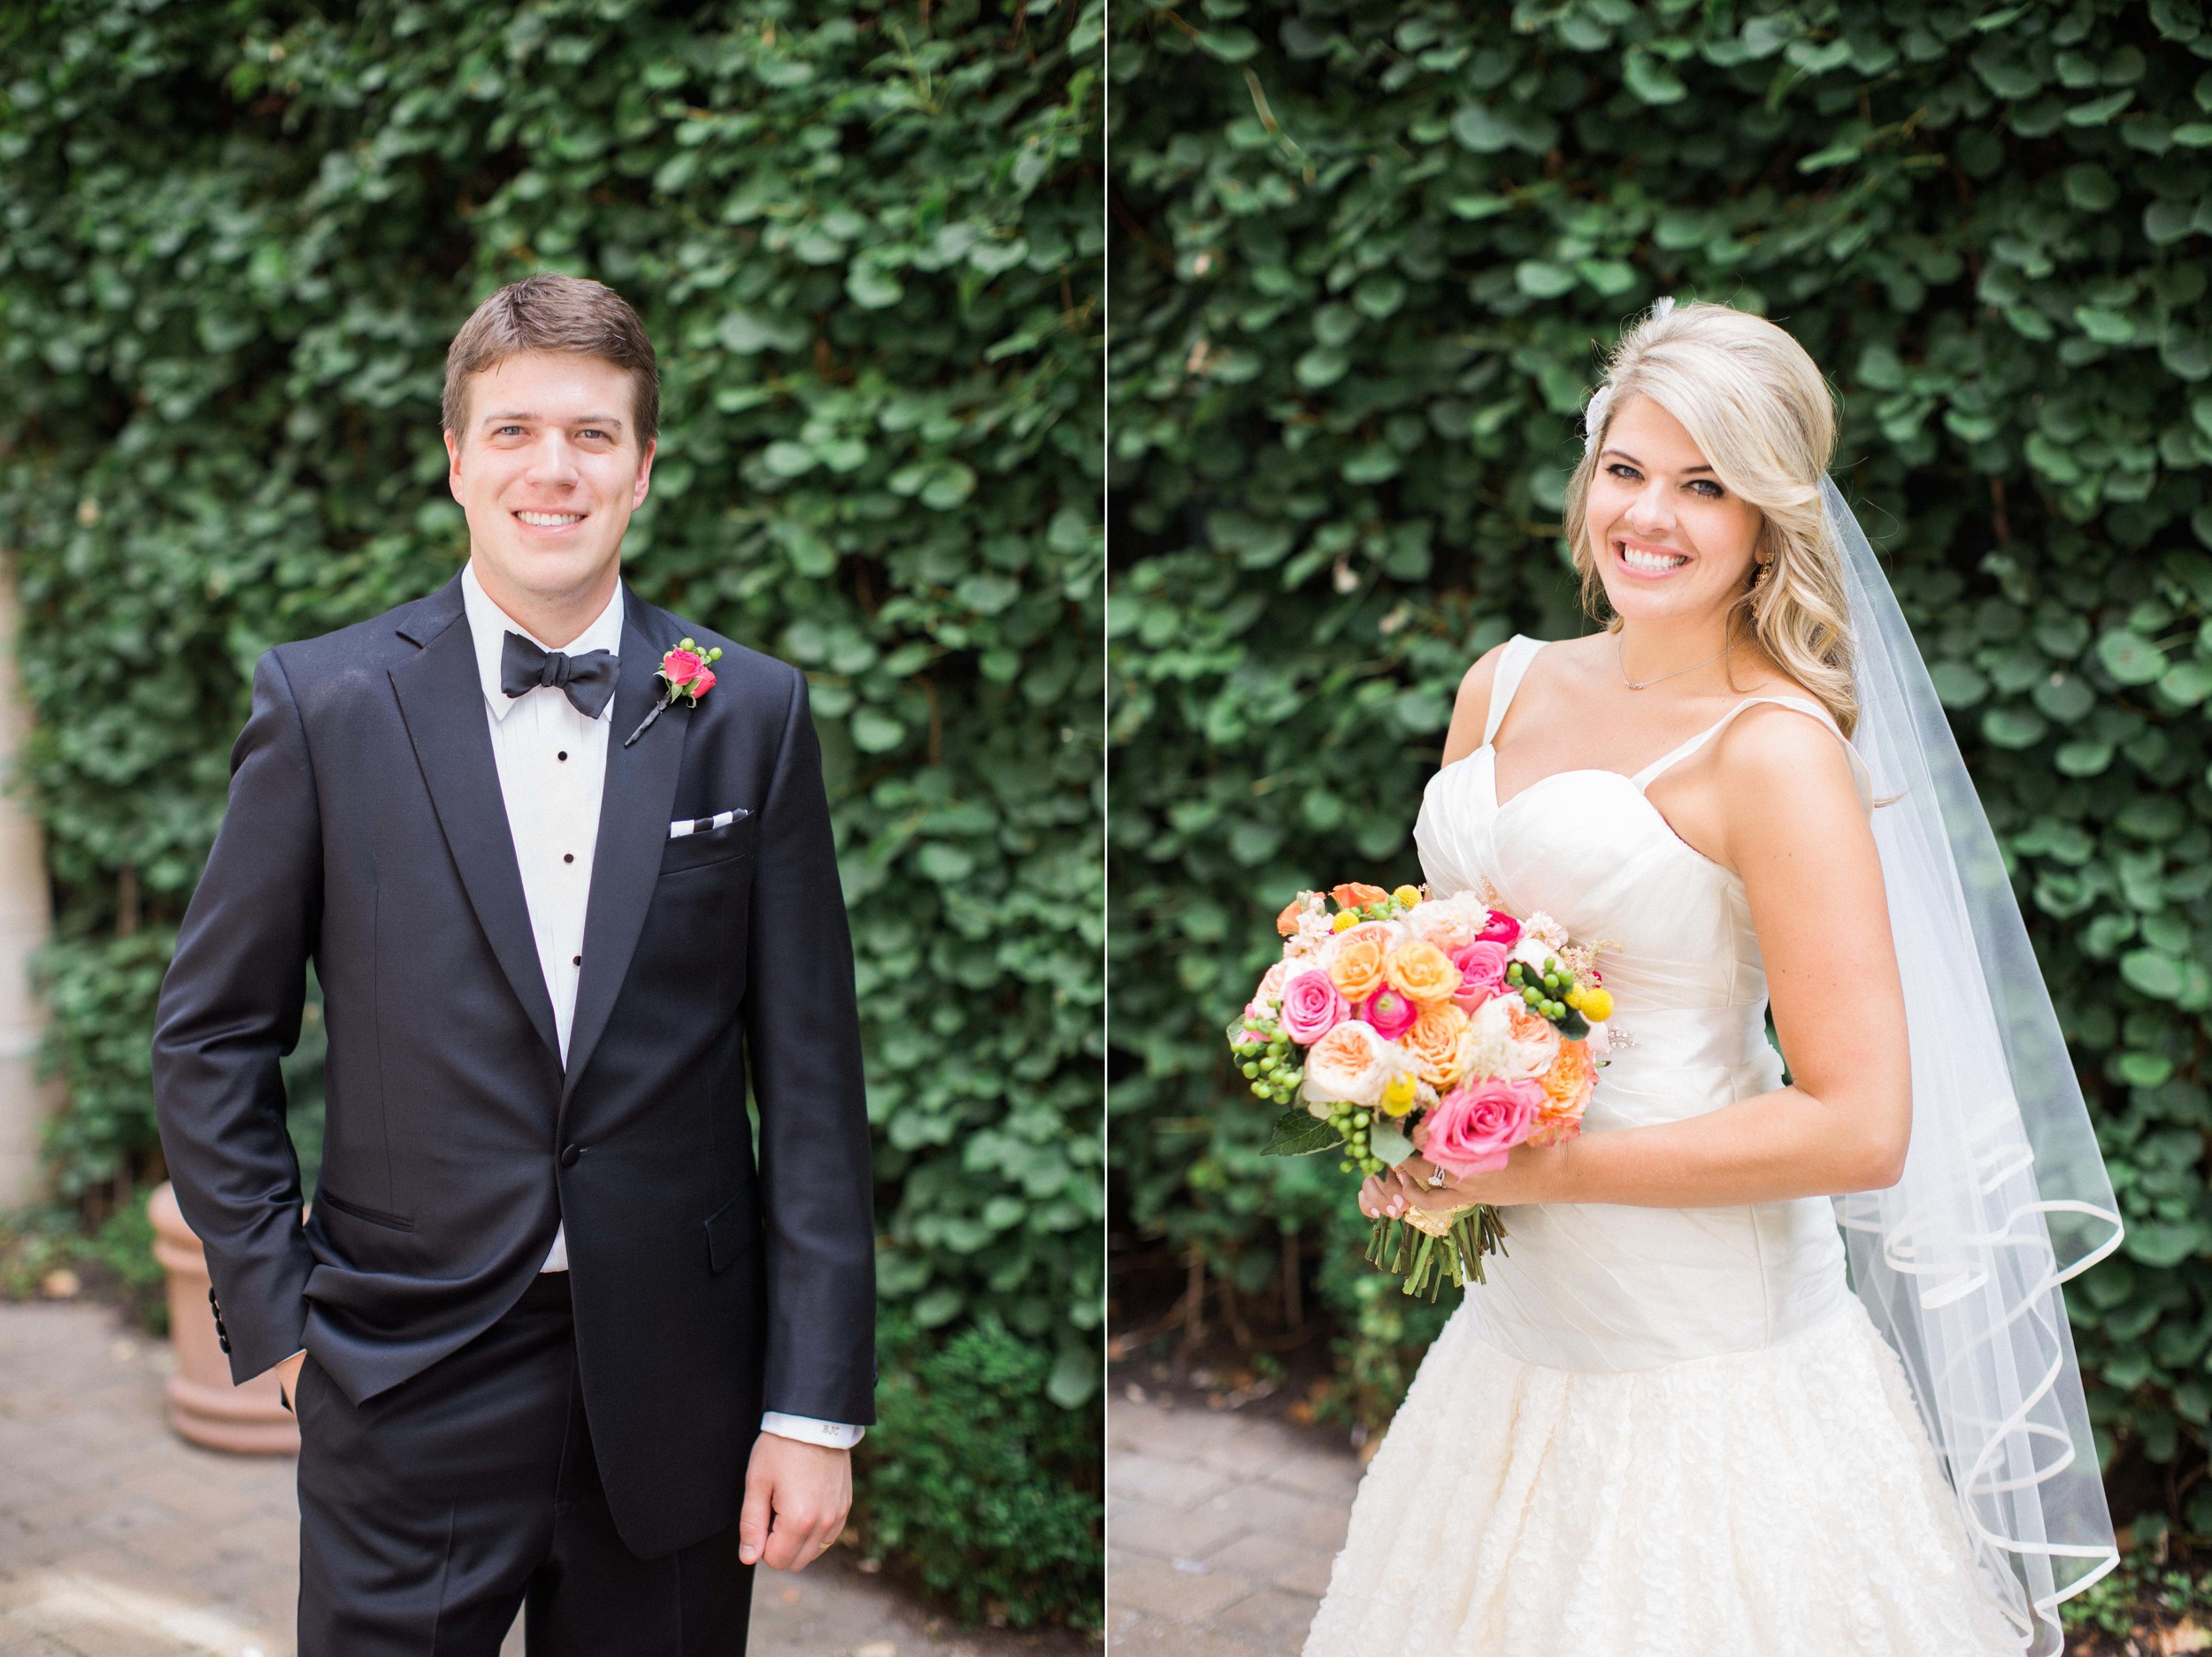 Chase Park Plaza St Louis Wedding Photo-1048 copy.jpg